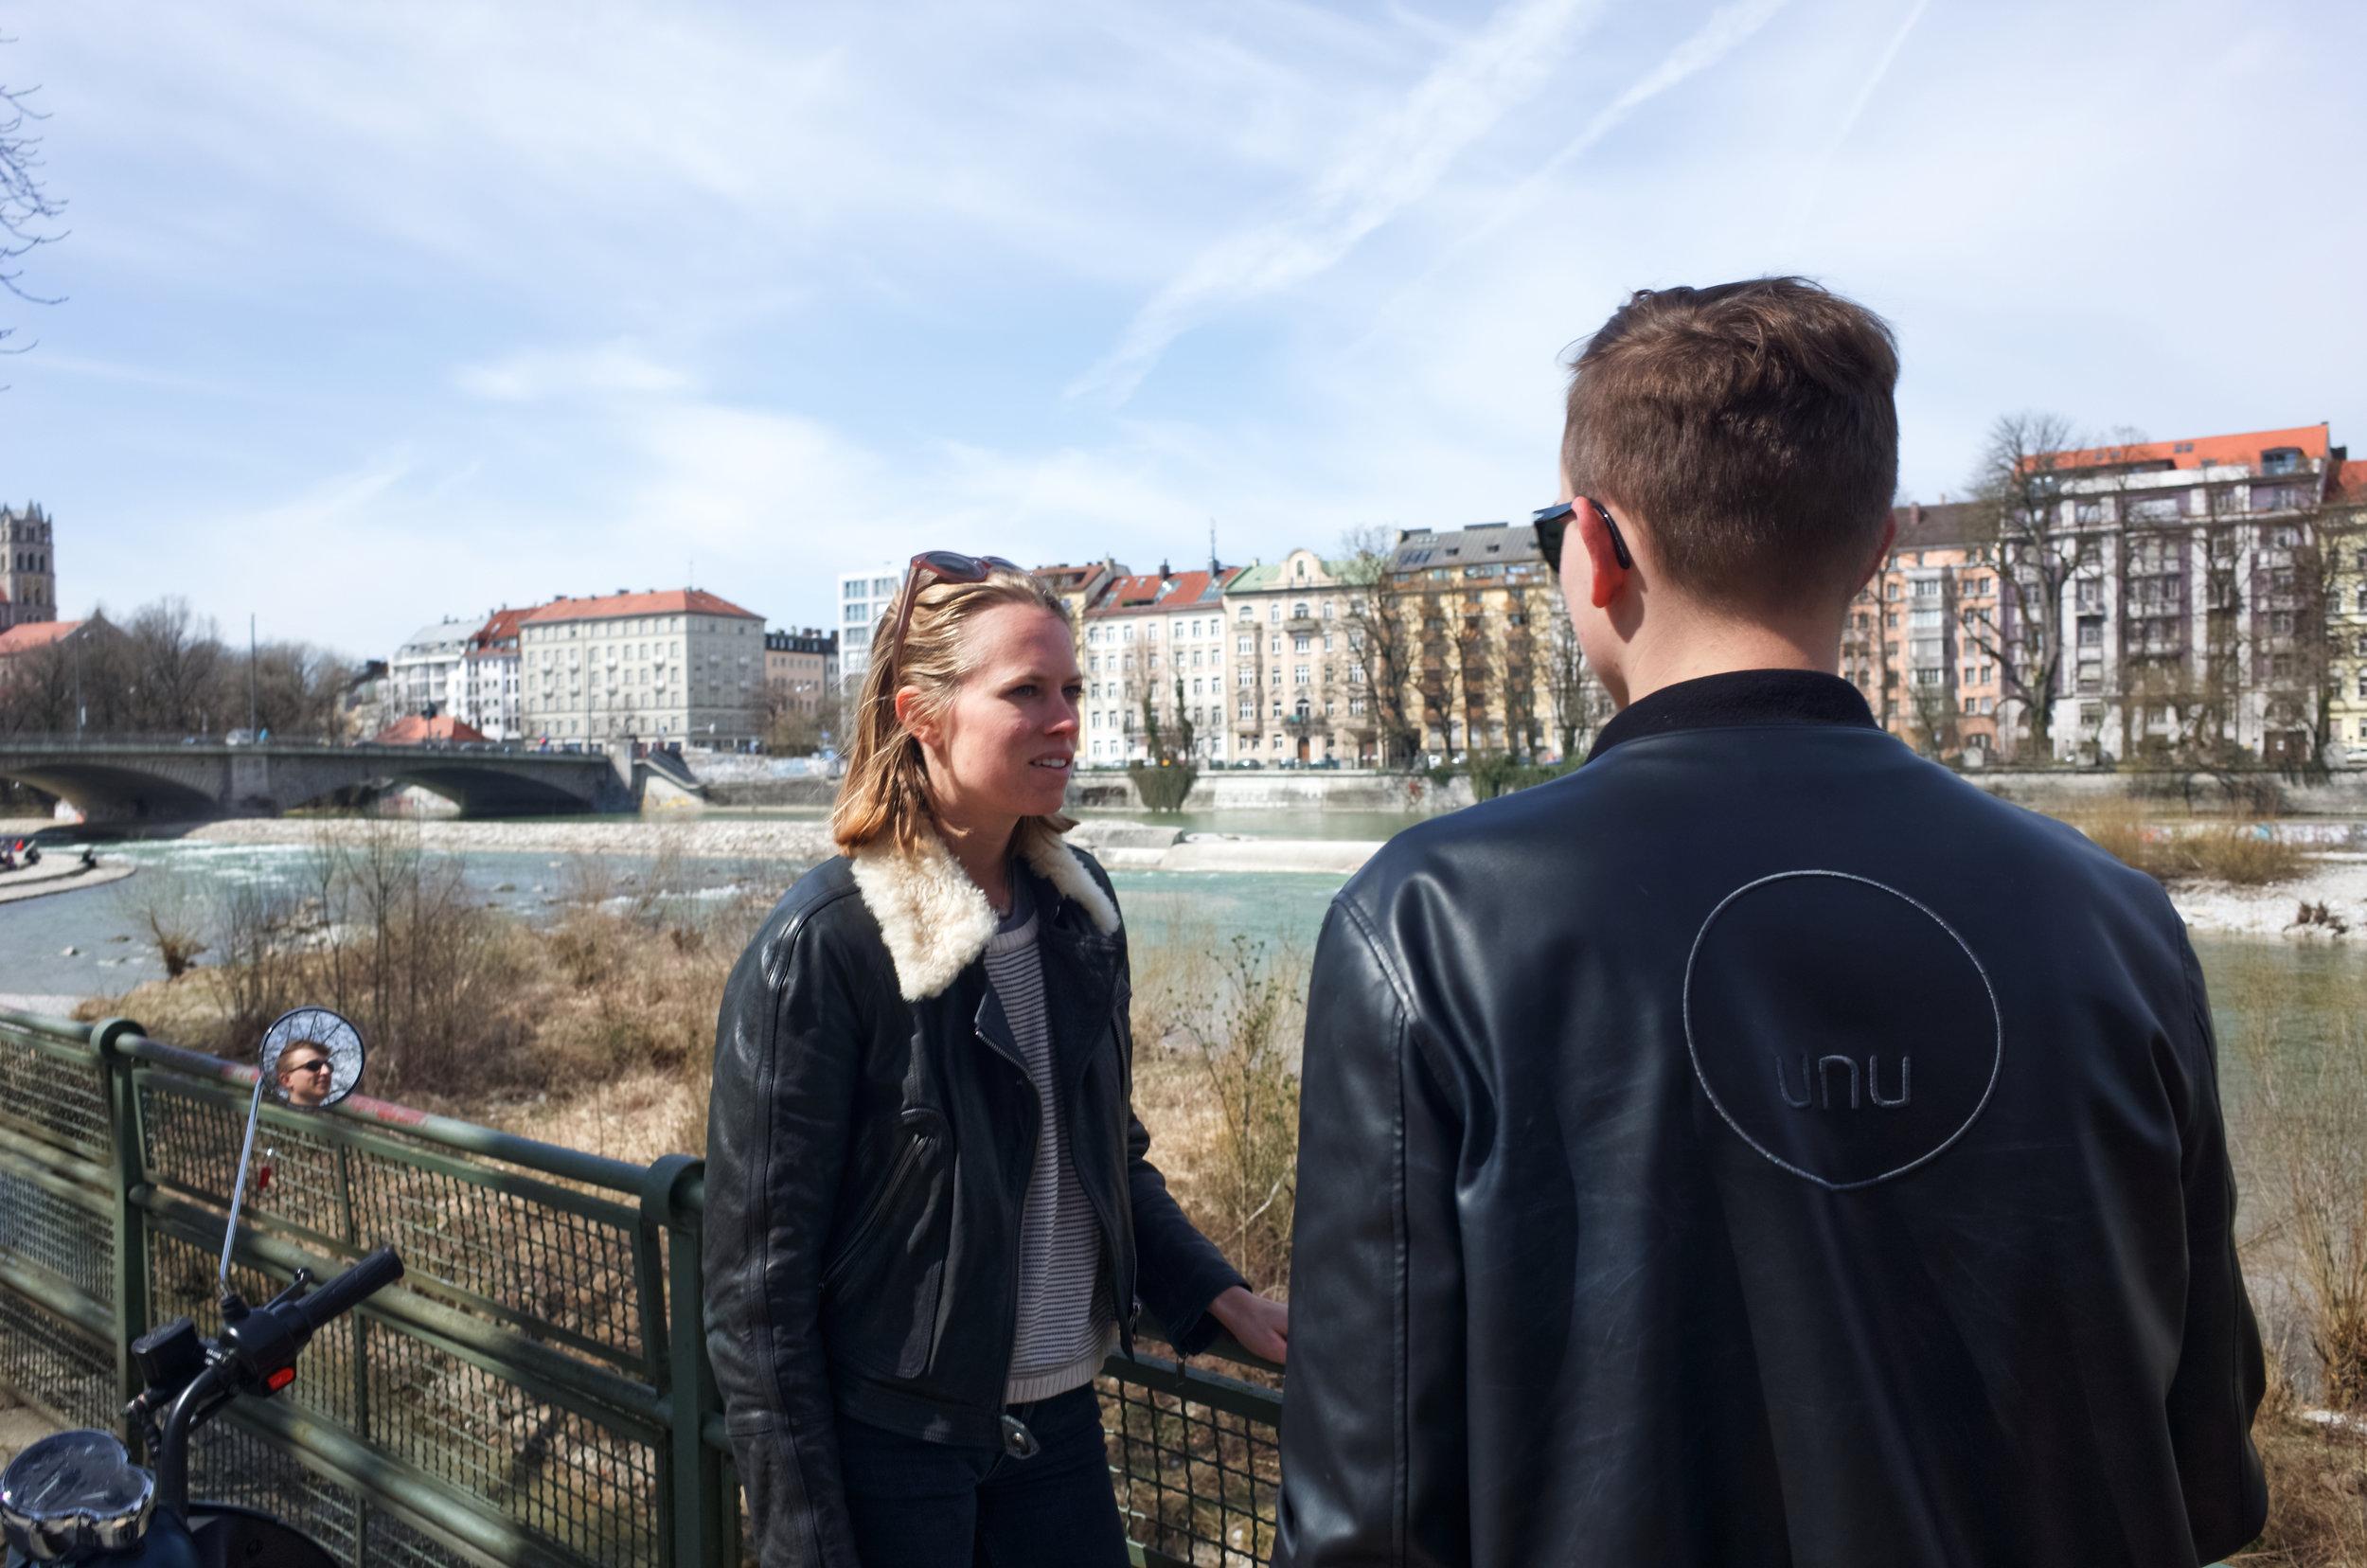 Meeting with Valentina Harrendorf, another of Munich's unu Pioneers.